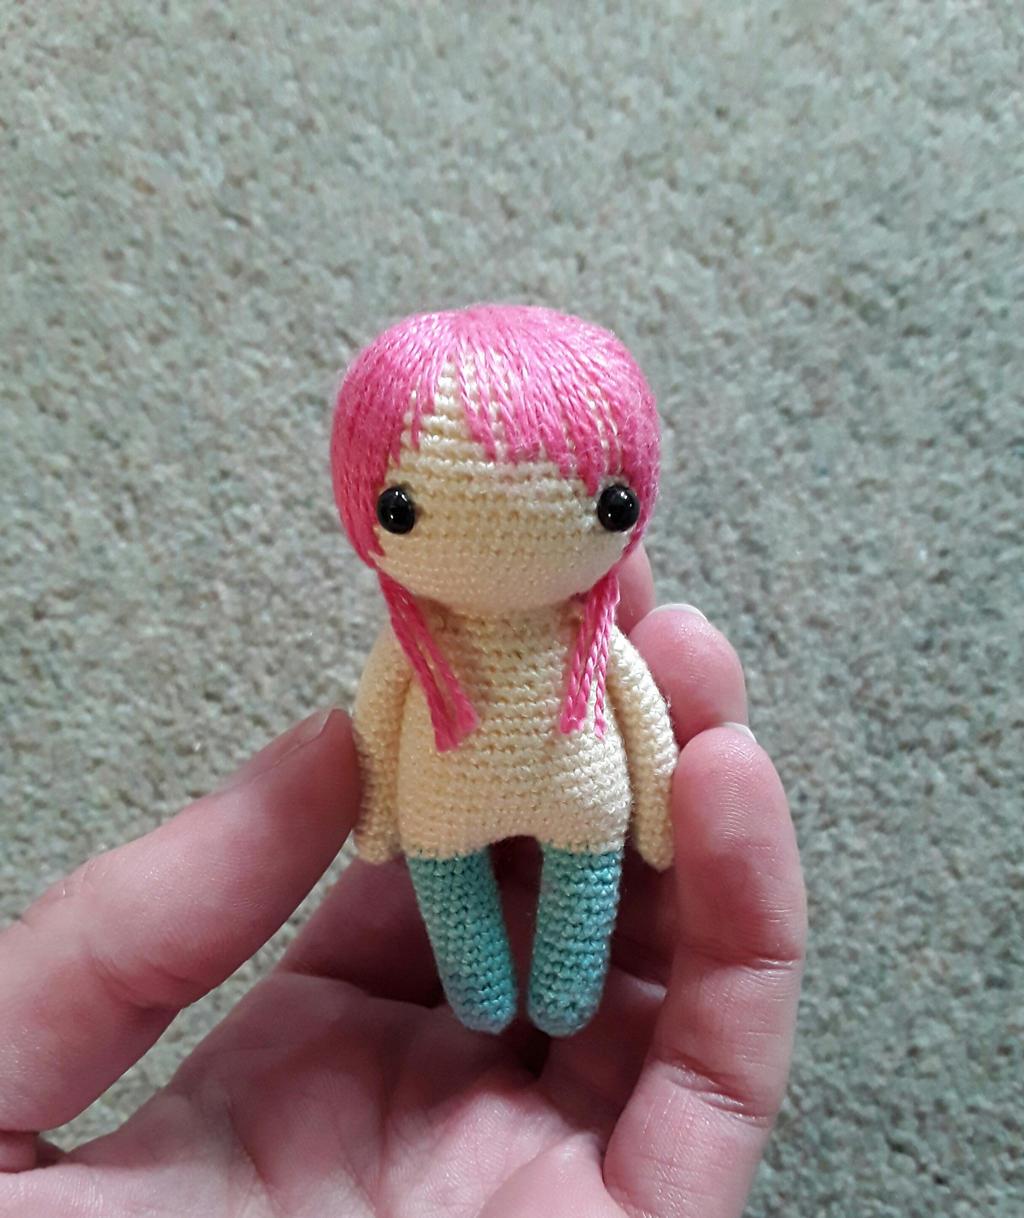 Amigurumi Doll Making : Amigurumi doll by Kizzydreaming9 on DeviantArt